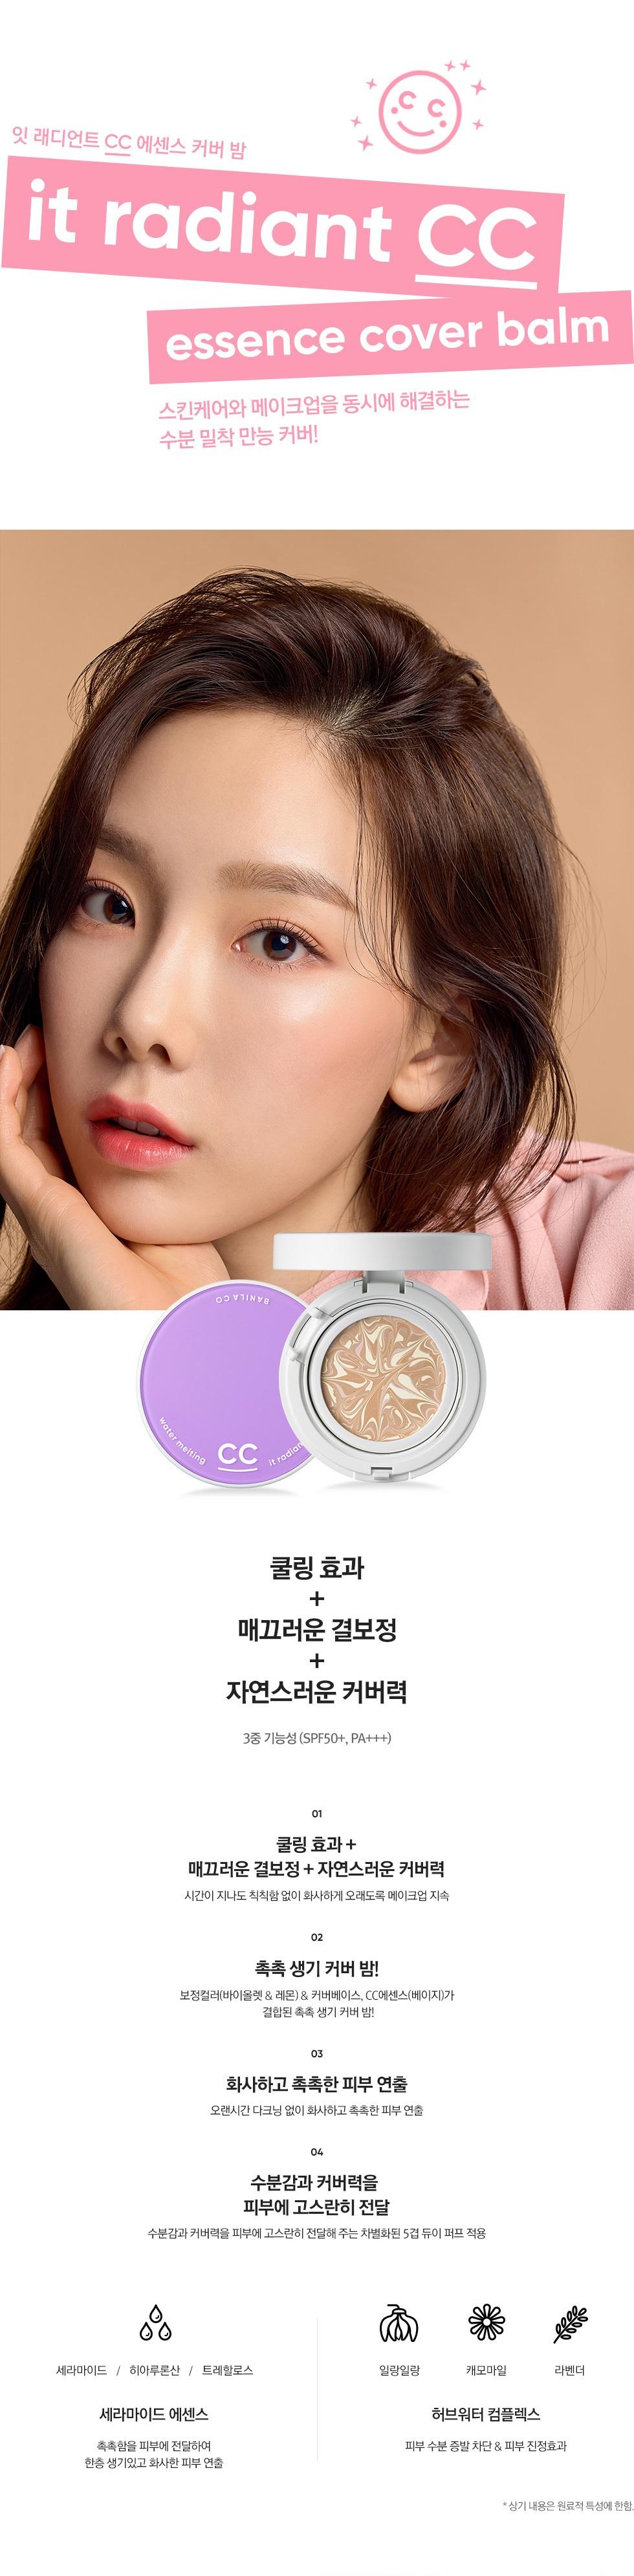 Banila Co It Radiant CC Essence Cover Balm 15g [2 type] korean comstic skincare product online shop malaysia India china1